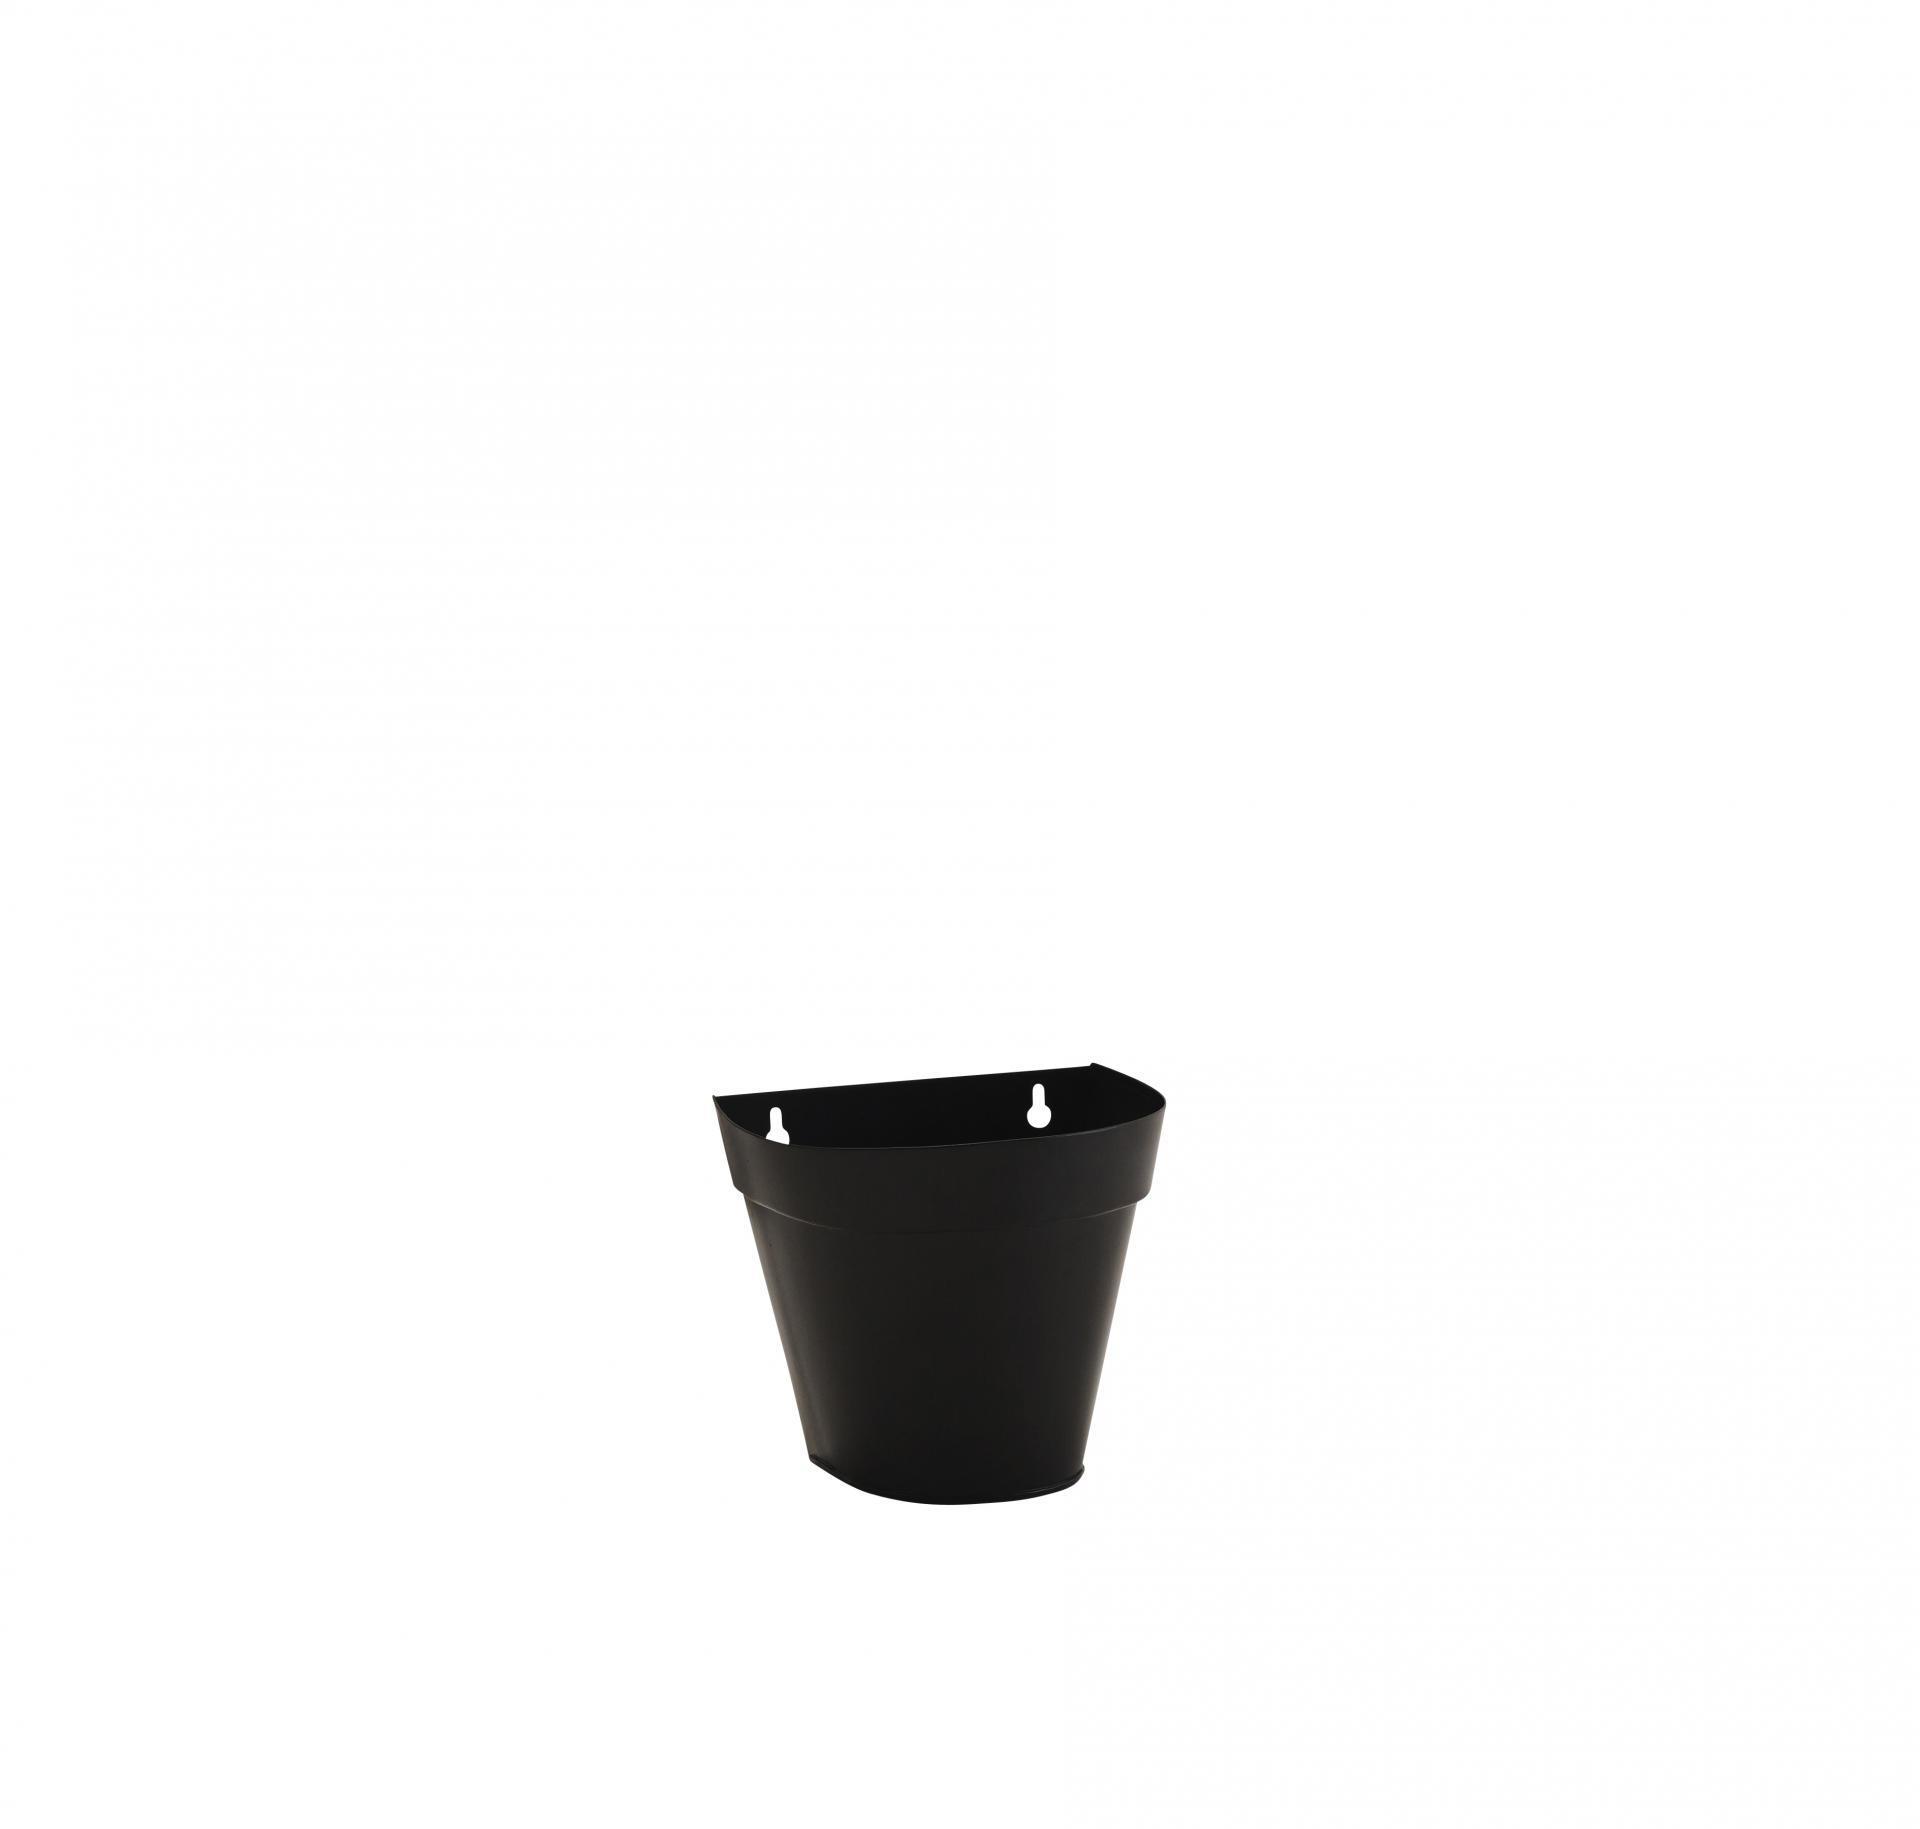 MADAM STOLTZ Nástěnný květináč Wall Black, černá barva, kov